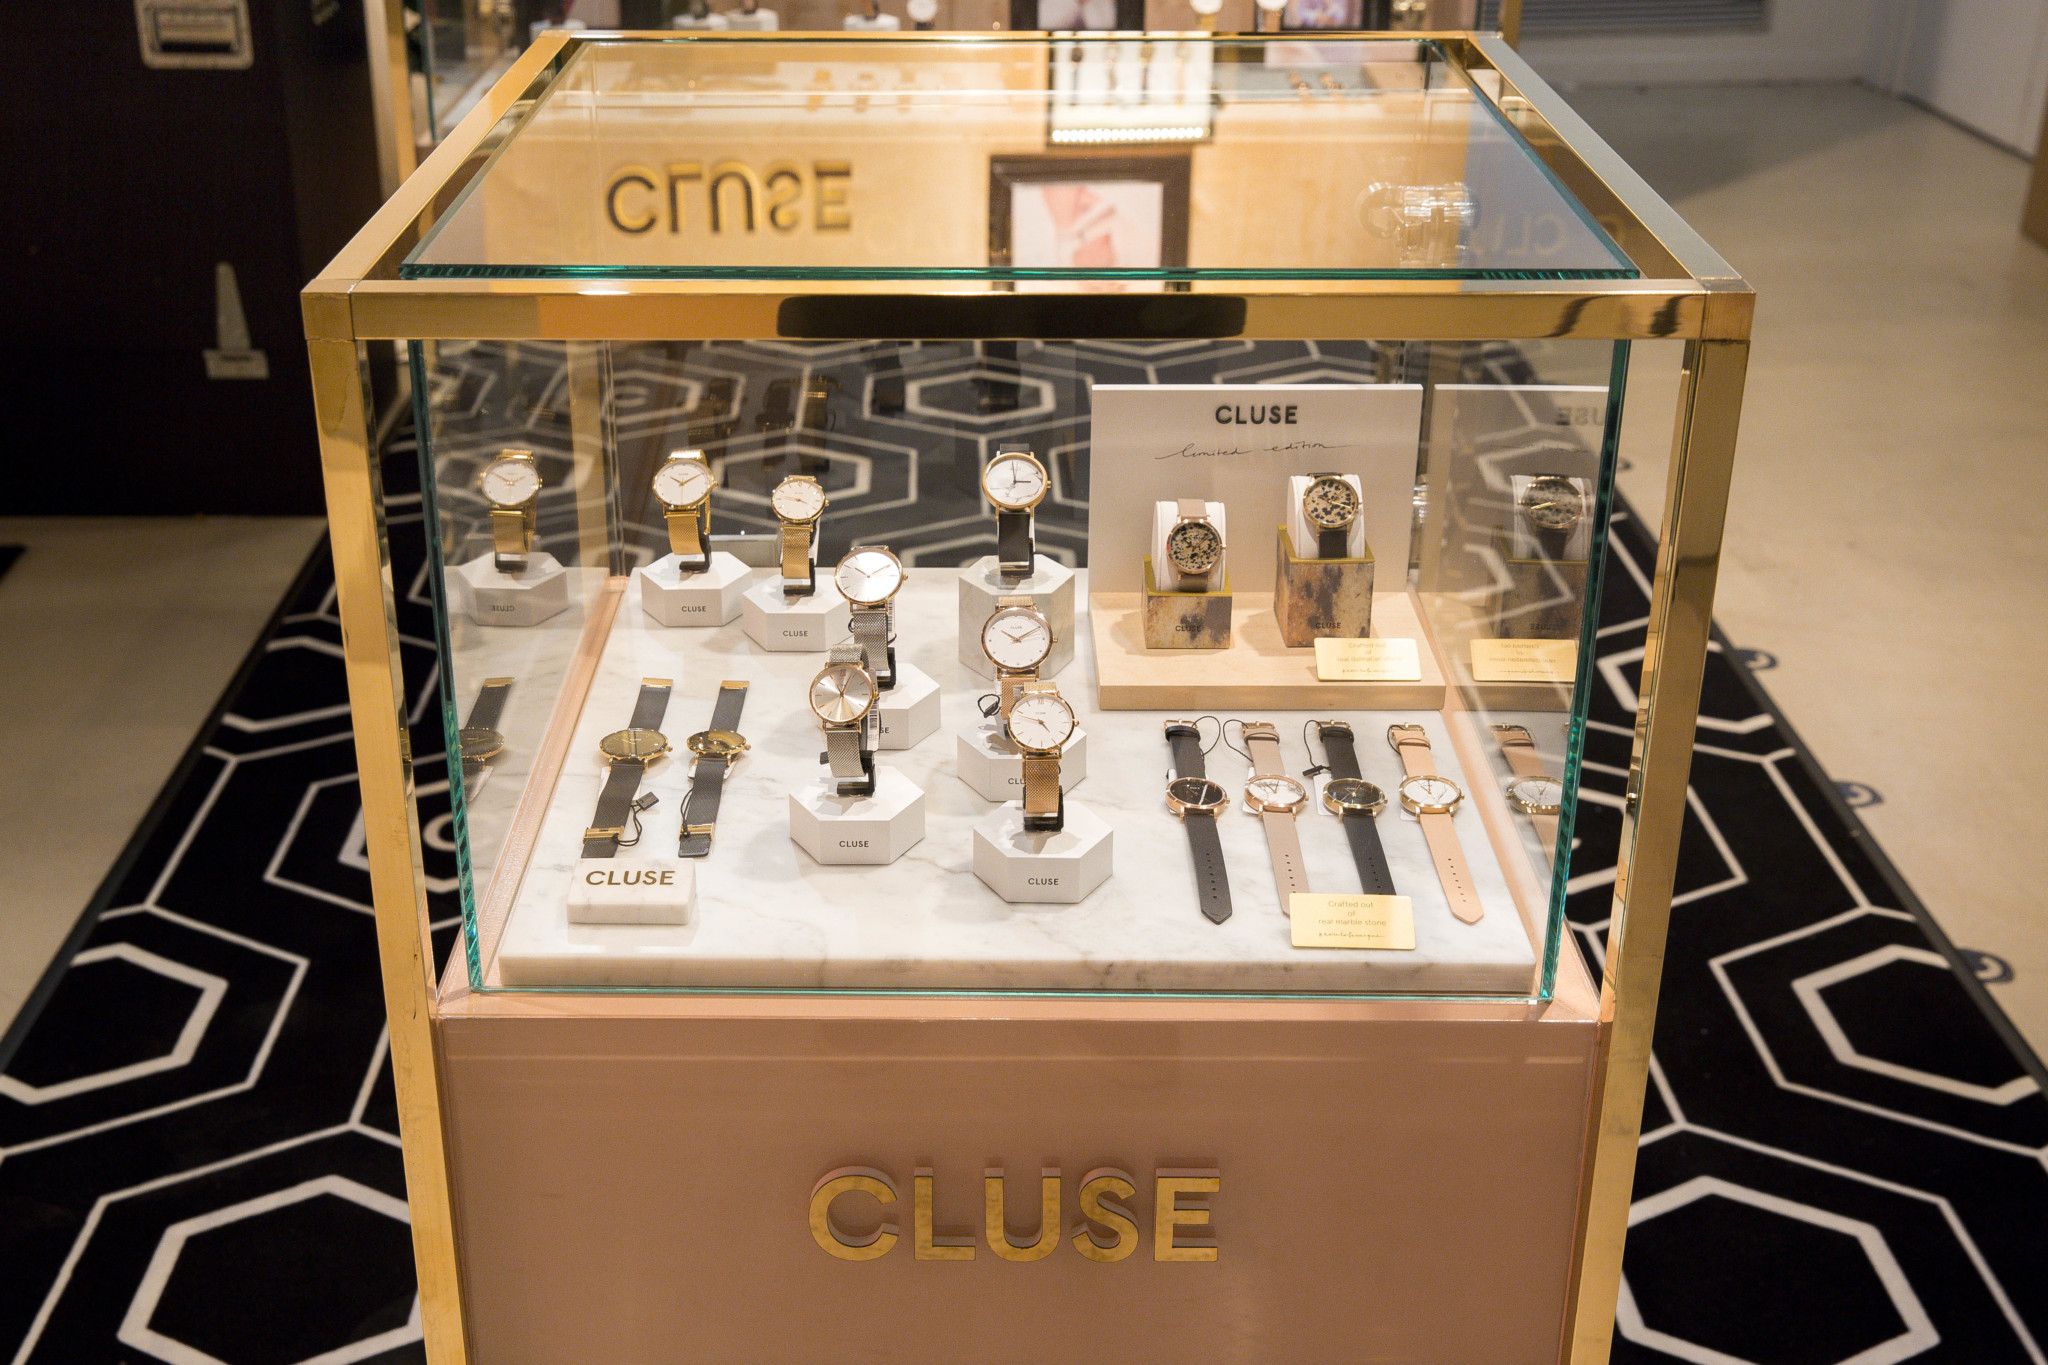 Cluse Citadium-609A6760-© Pascal Montary